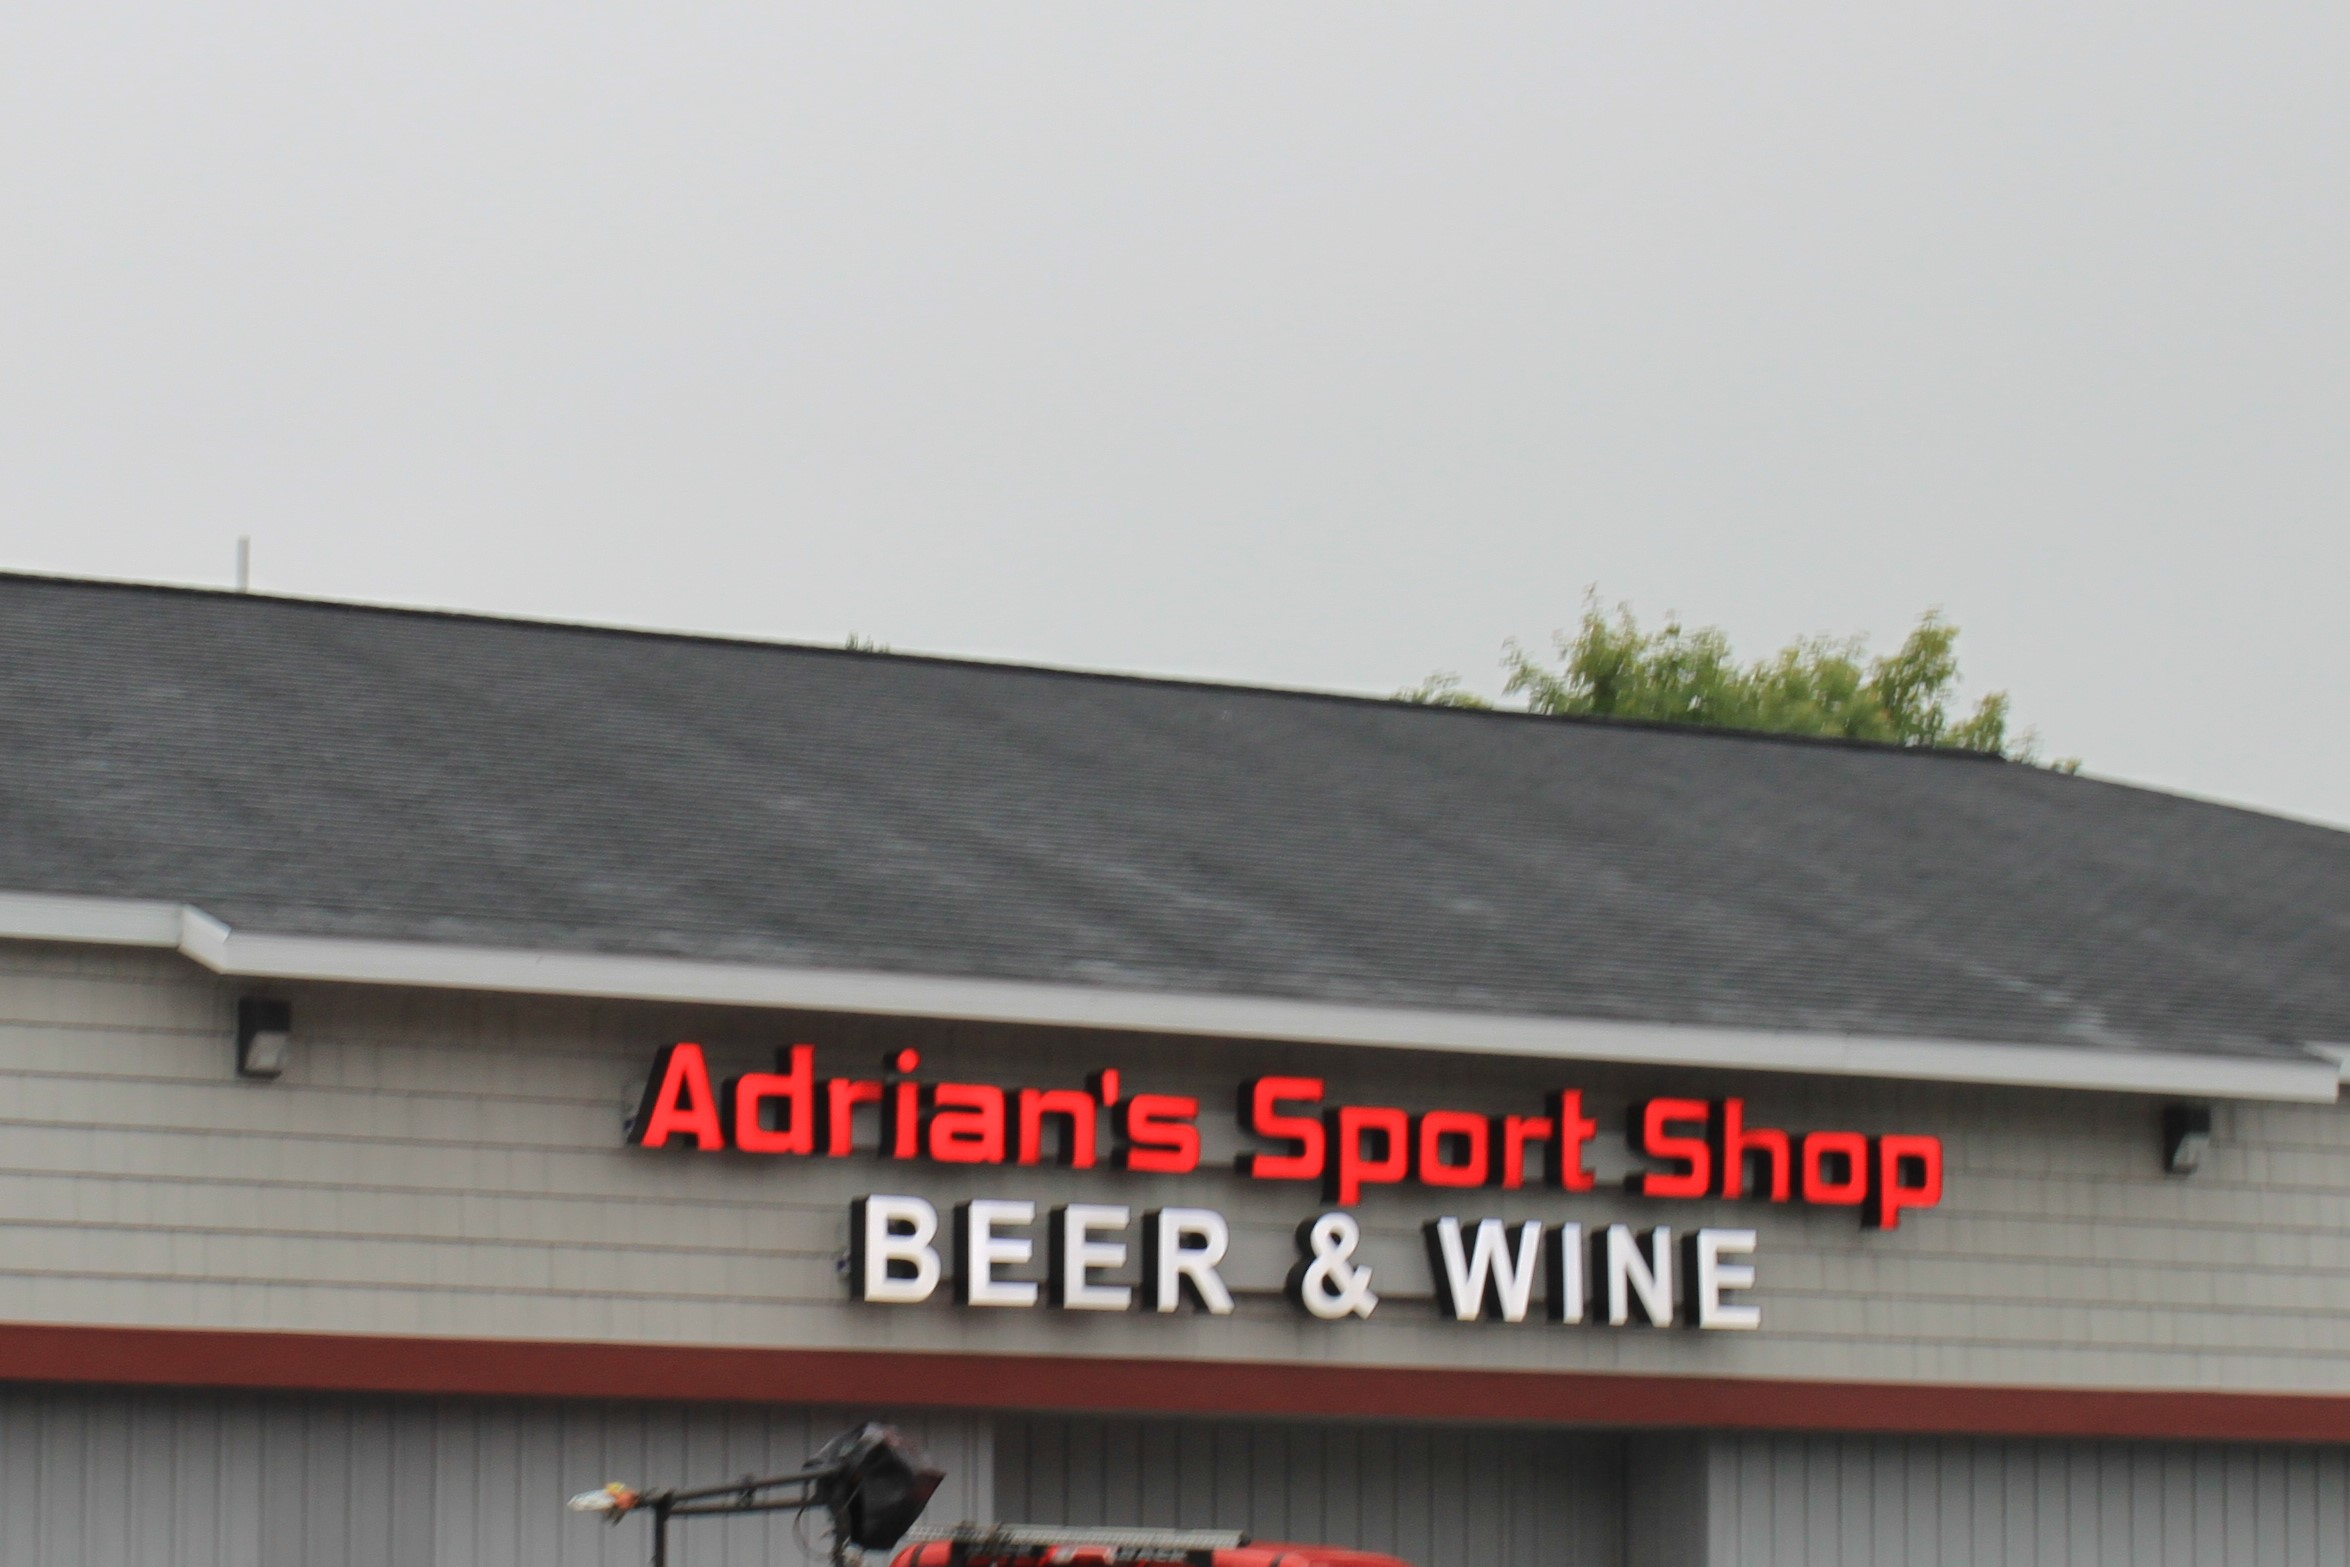 Basel Oil & Propane Co. Adrian's Sports Shop - 335 North Bradley Hwy.Rogers City, MI 49779(989) 734-2303